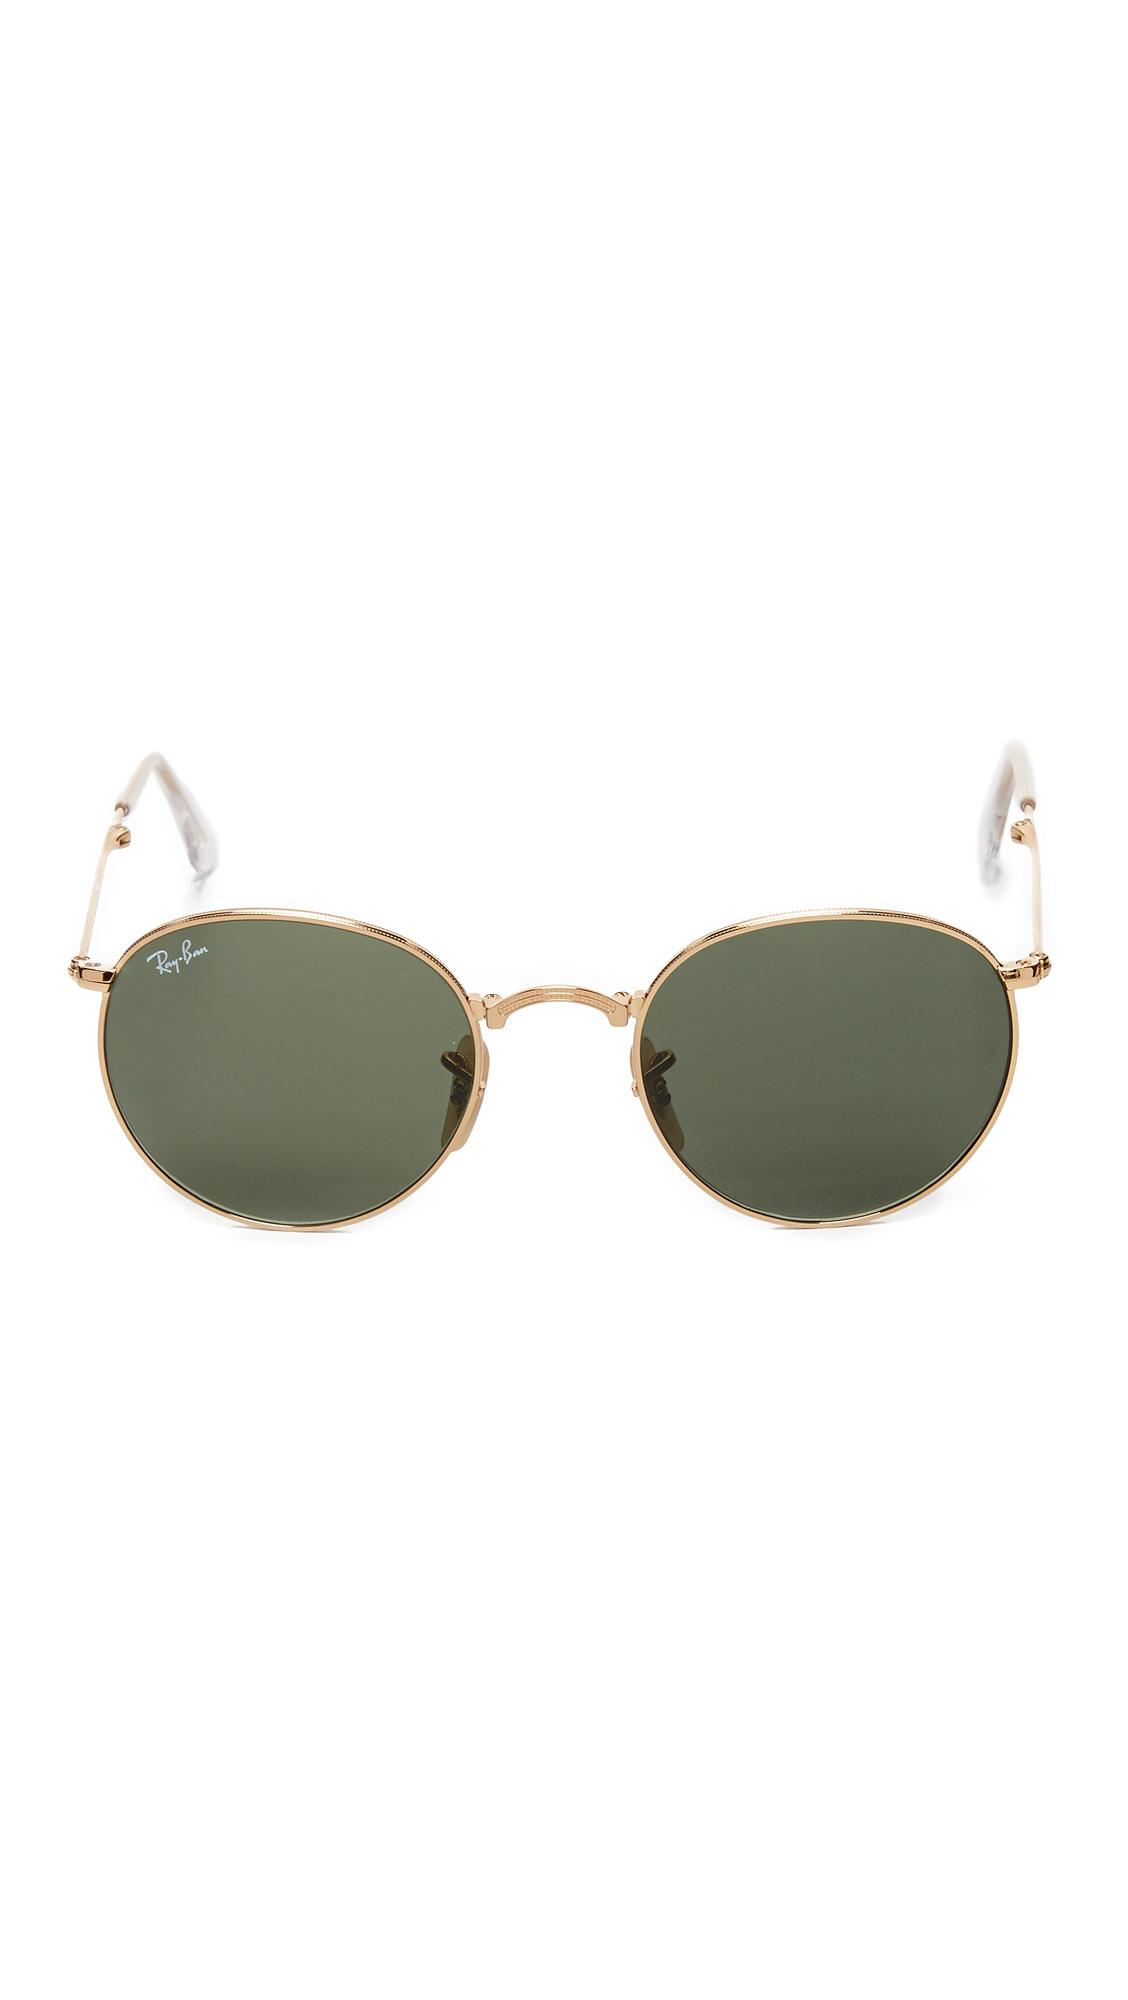 Ray-Ban Icons Round Sunglasses   SHOPBOP 309cefa5fe7b